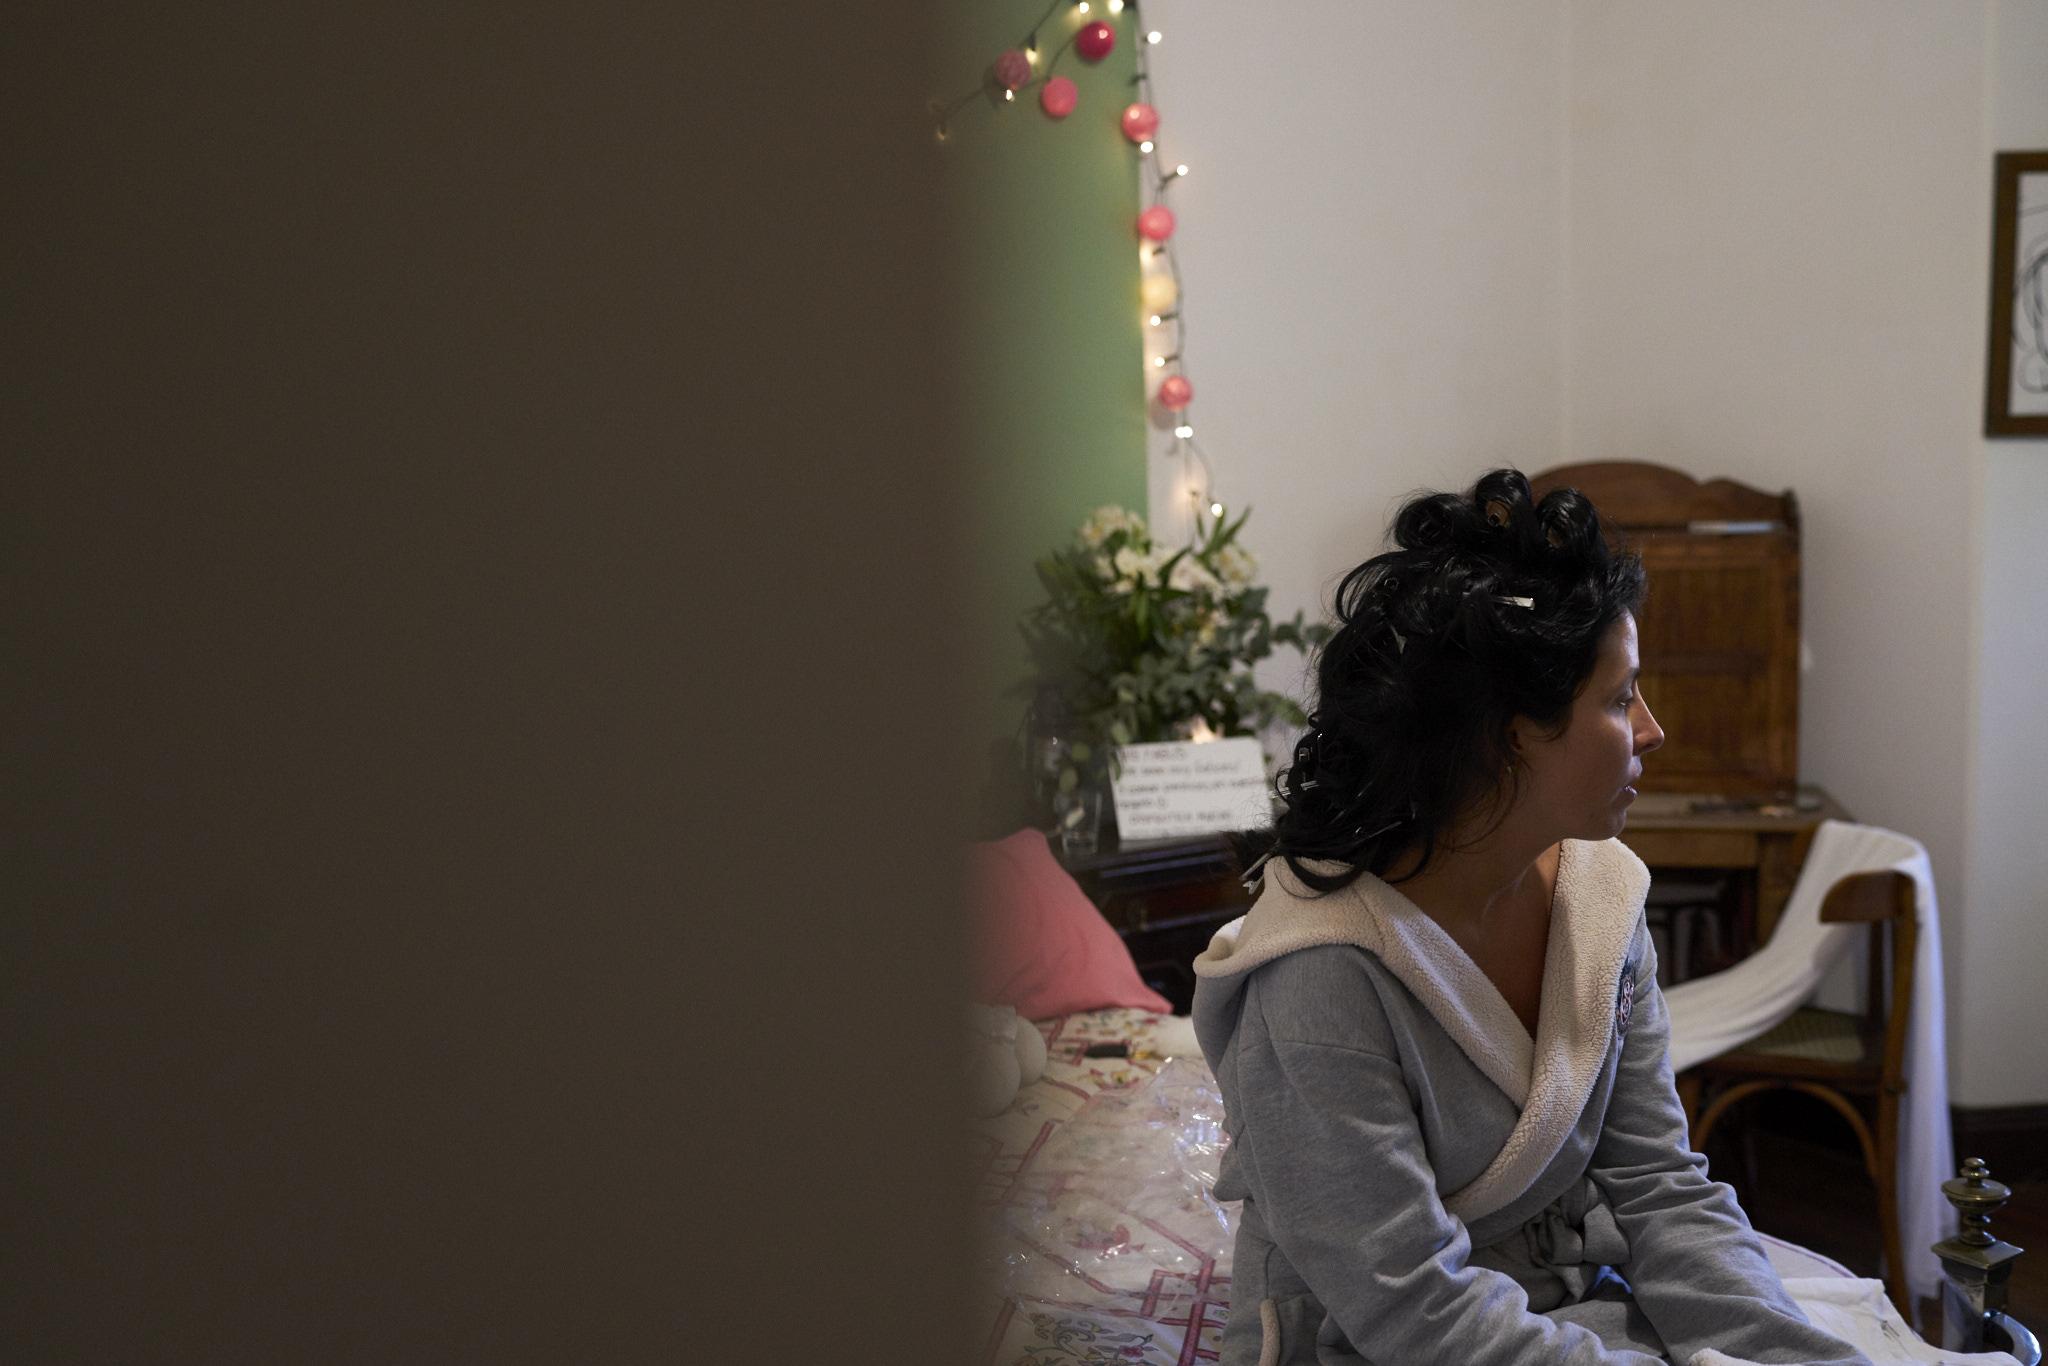 Fotografo de Casamientos - Bodas en Tucson - Cordoba DSC05943.jpg